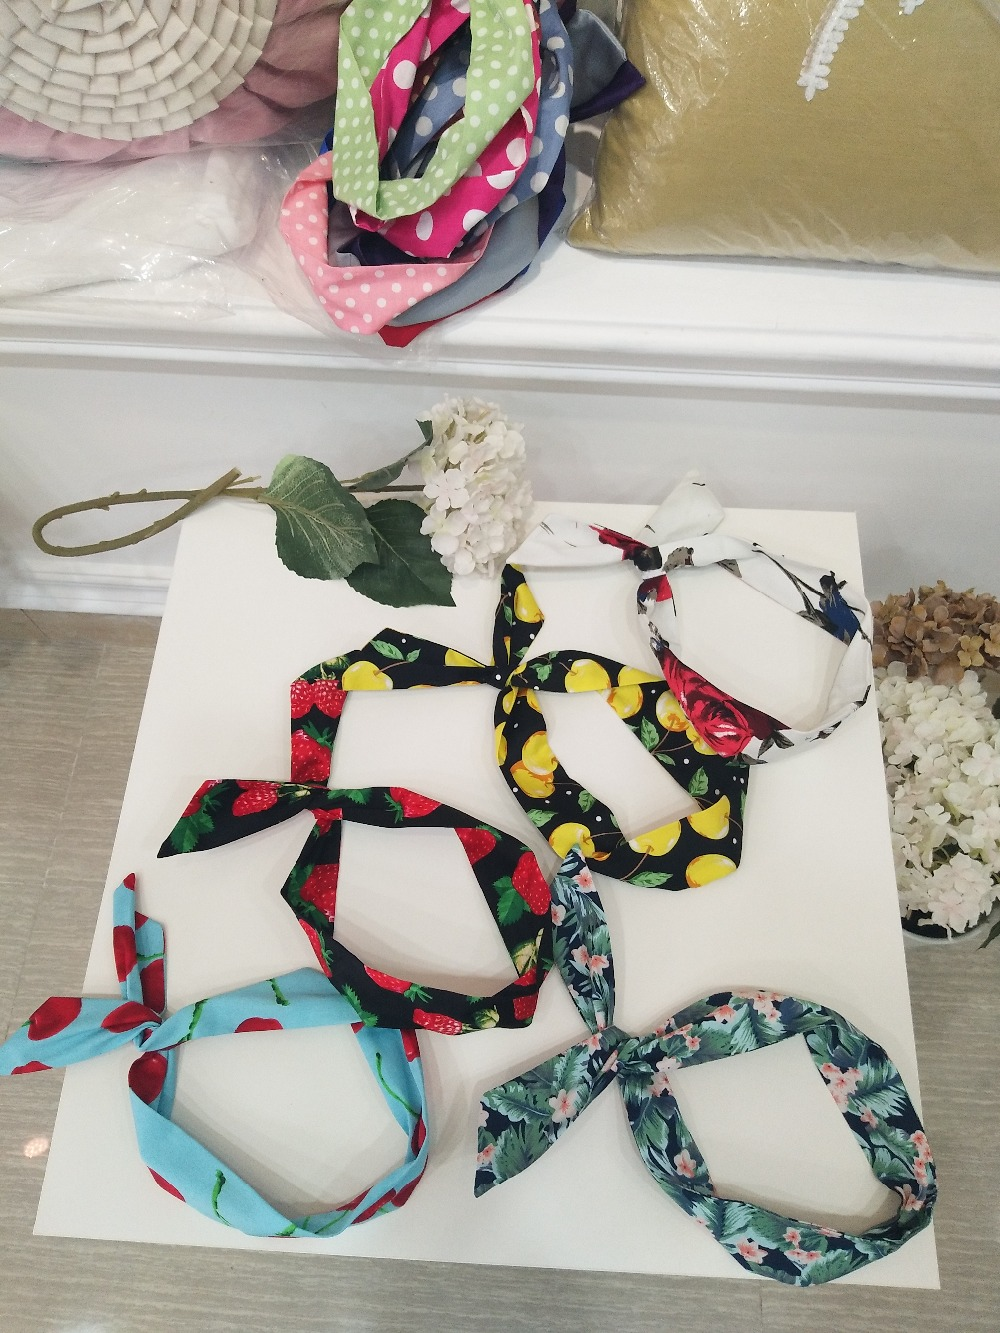 5pcs/lot Vintage Dot Floral Print Wire Headband Pinup Rockabilly Head Wrap Scarf Wholesale Lemon Hair Accessories ...